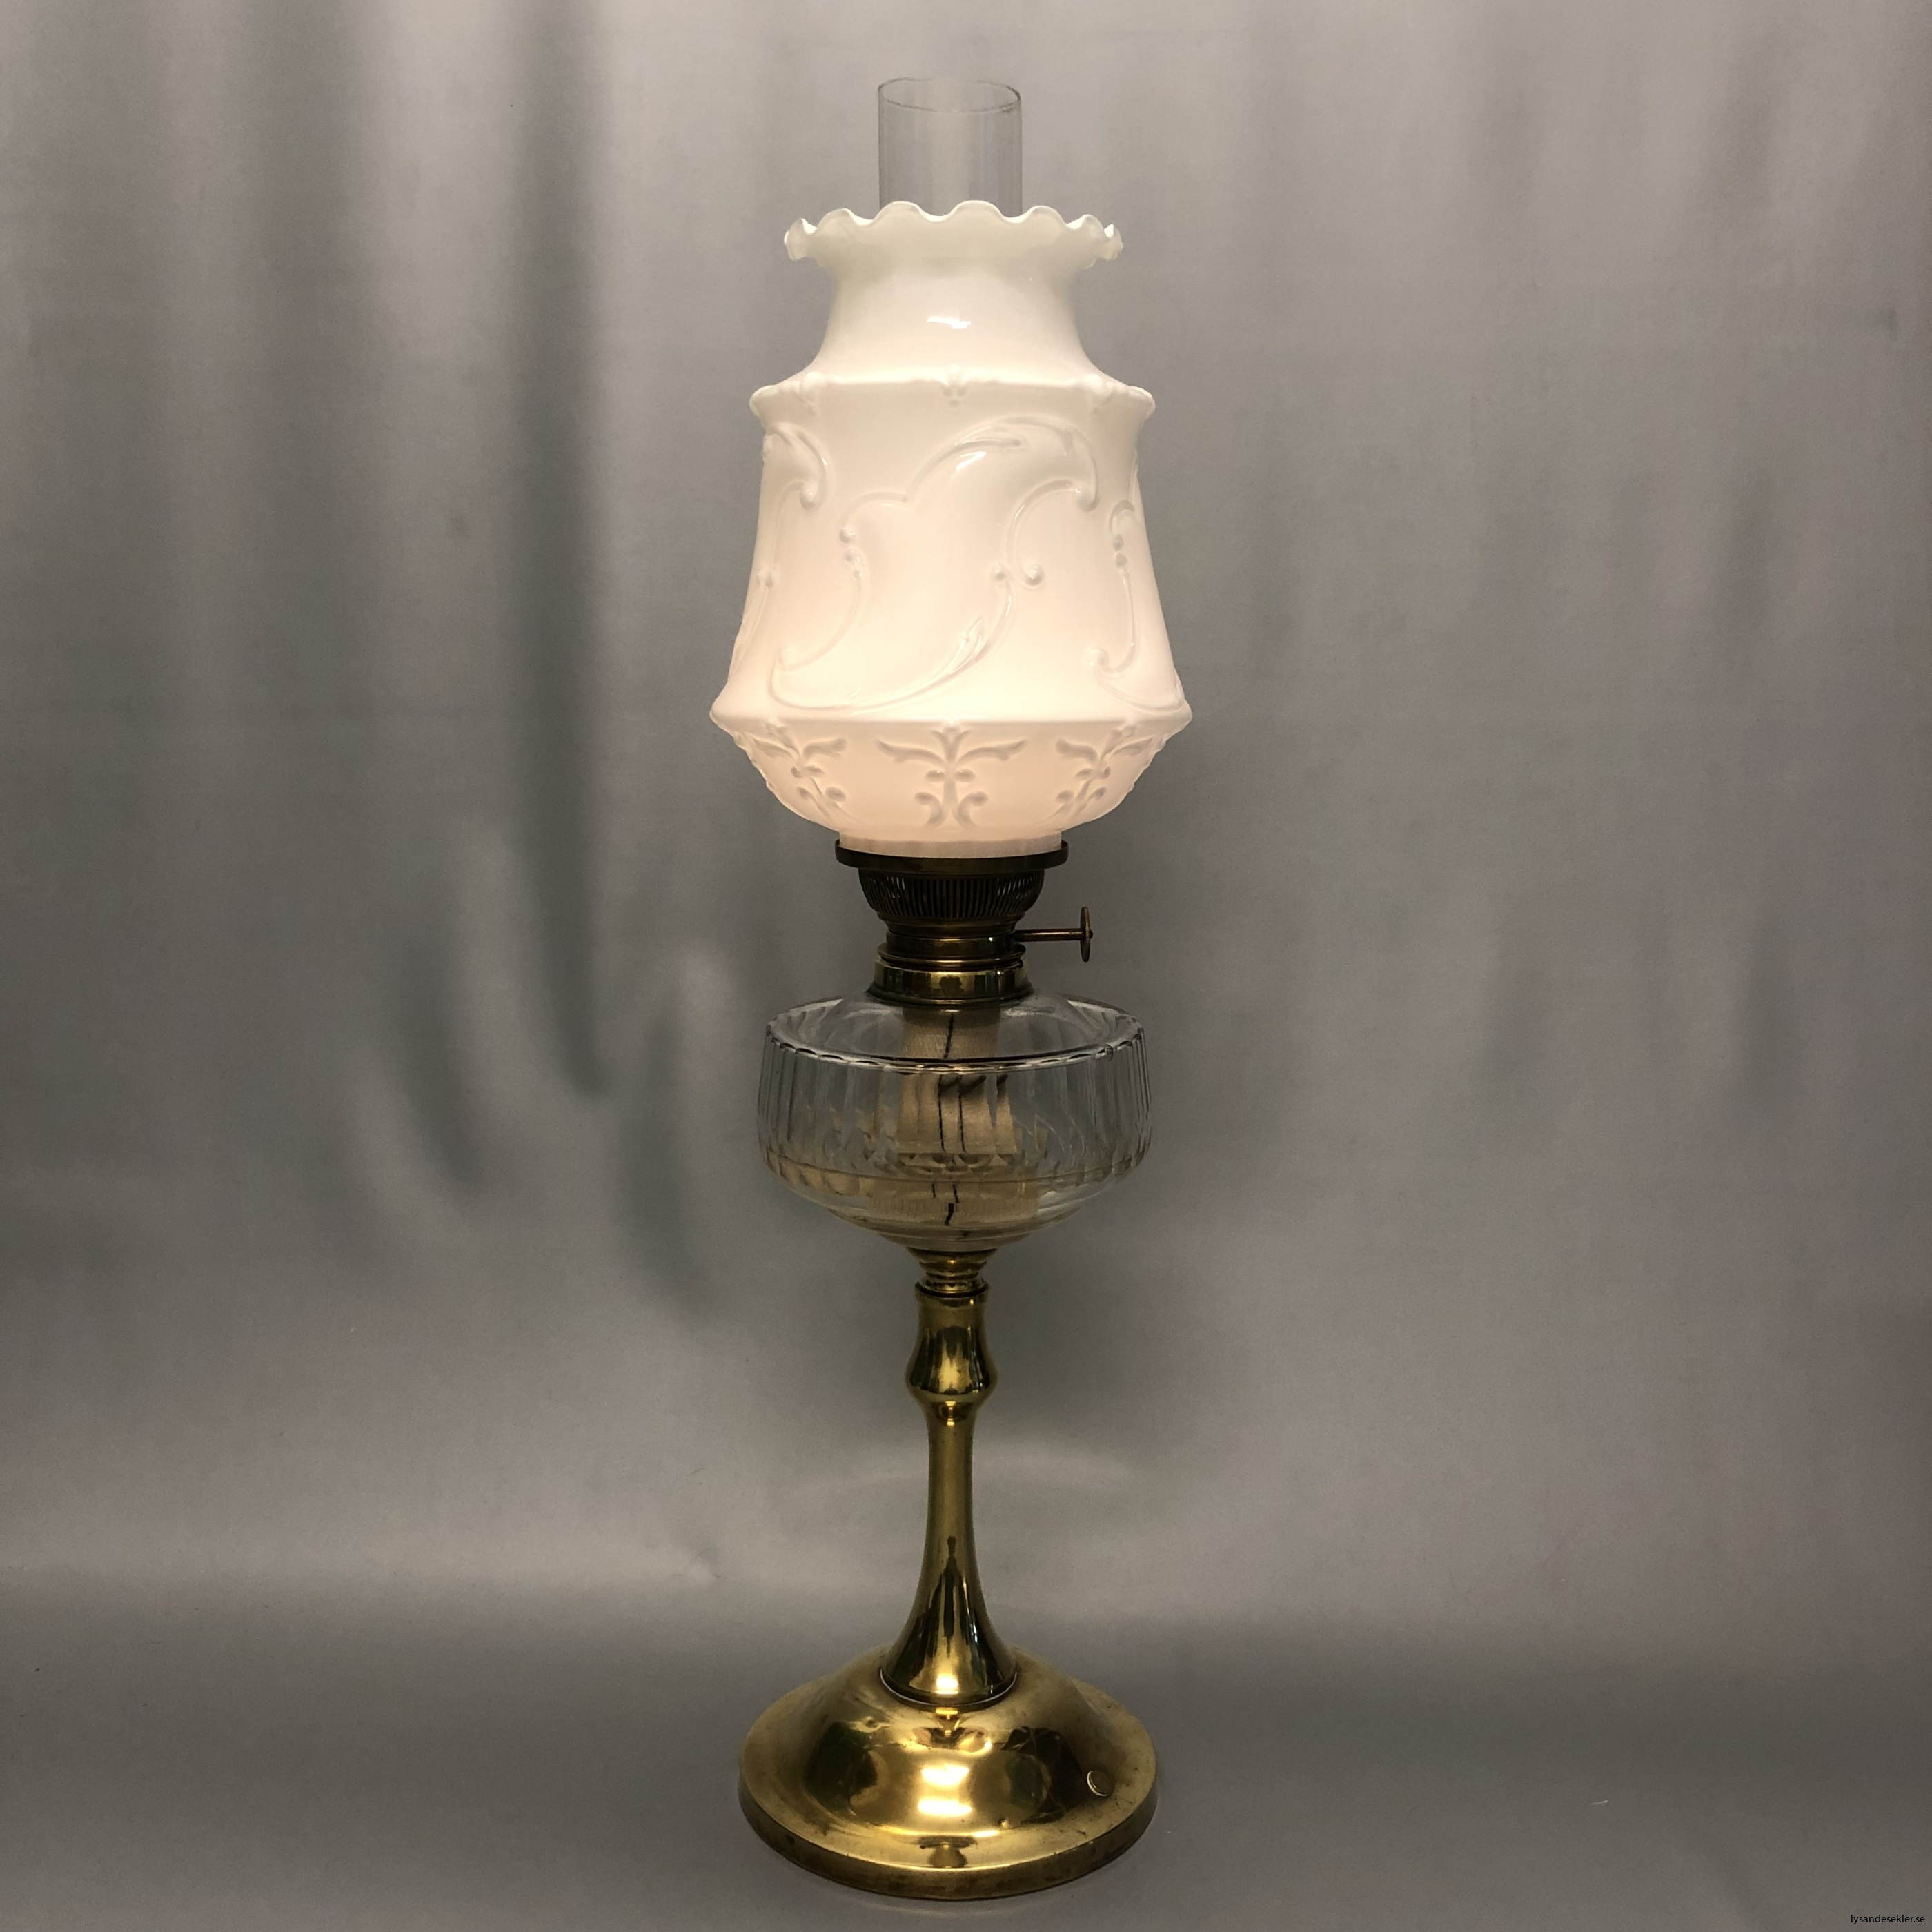 fotogenlampskupa kupa till fotogenlampa tulipan tulpan tulpankupor kupor2